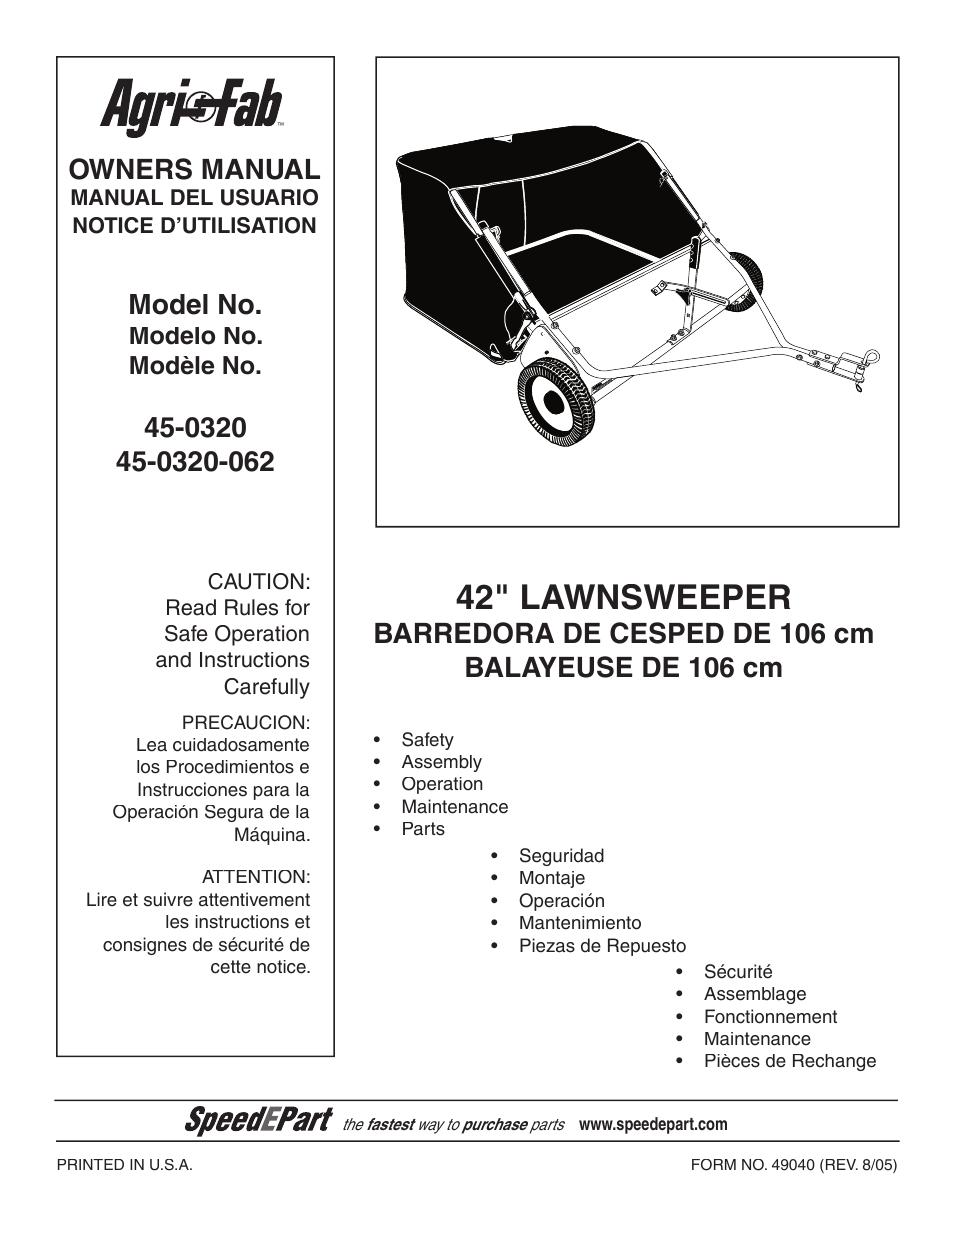 agri fab 45 0320 user manual 28 pages rh manualsdir com Agri-Fab Lawn Vacuum Parts List Agri-Fab Spreader Parts List